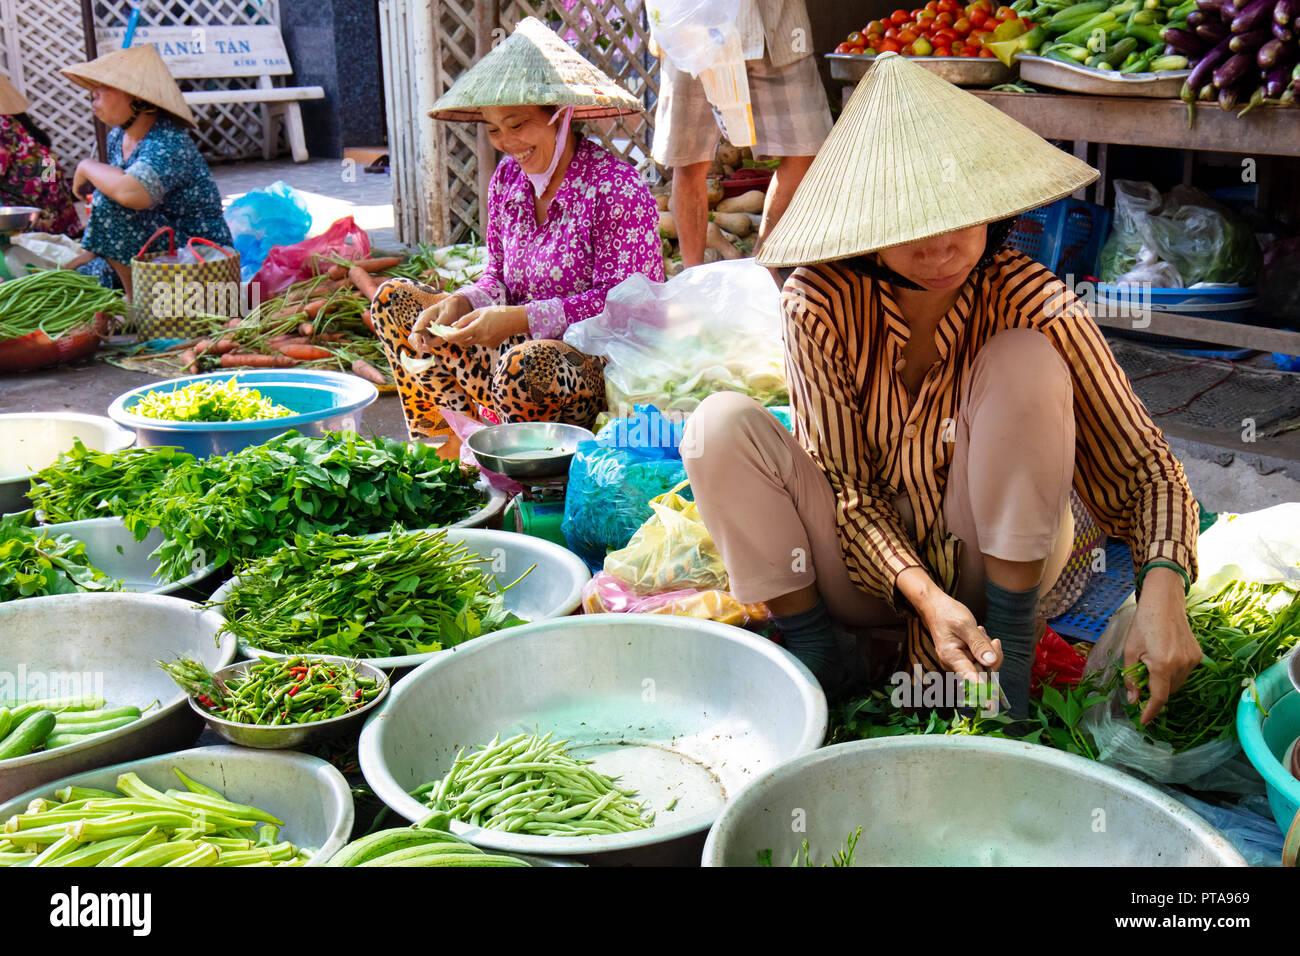 Cai Be Market Stall - Stock Image